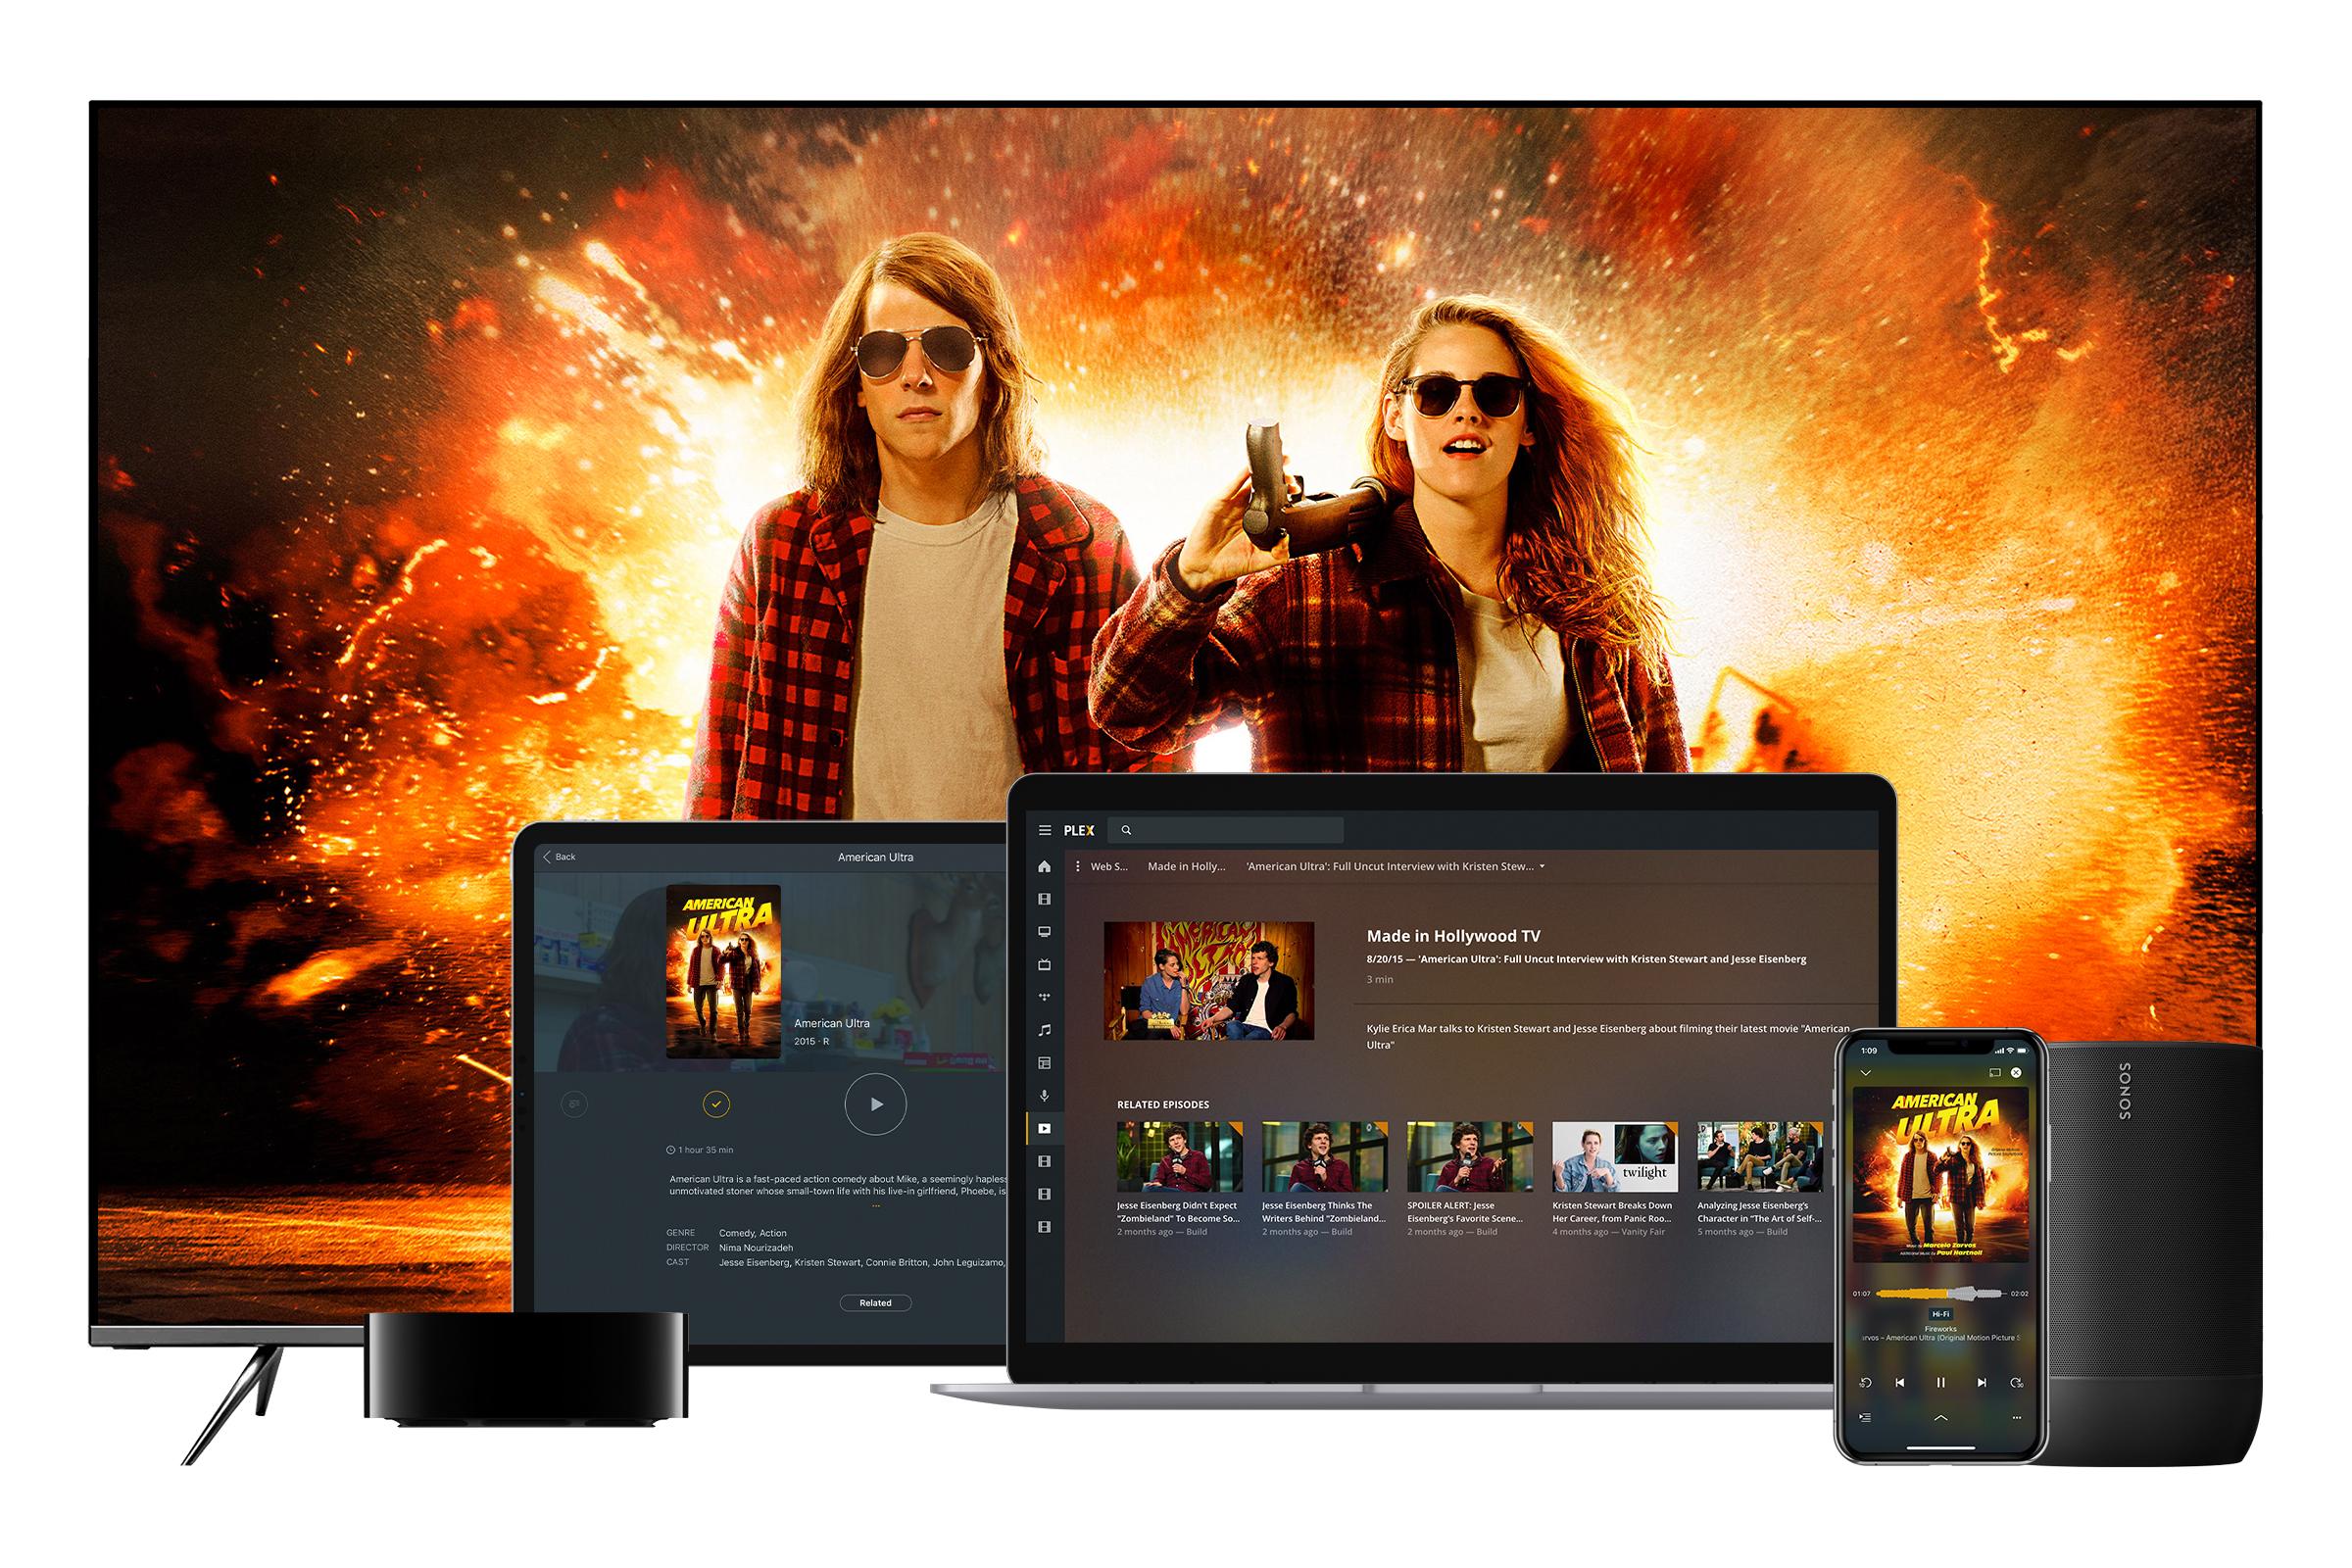 Plex تُقدّم خدمة البث المباشر المجانية للأفلام والبرامج التلفزيونية وأكثر